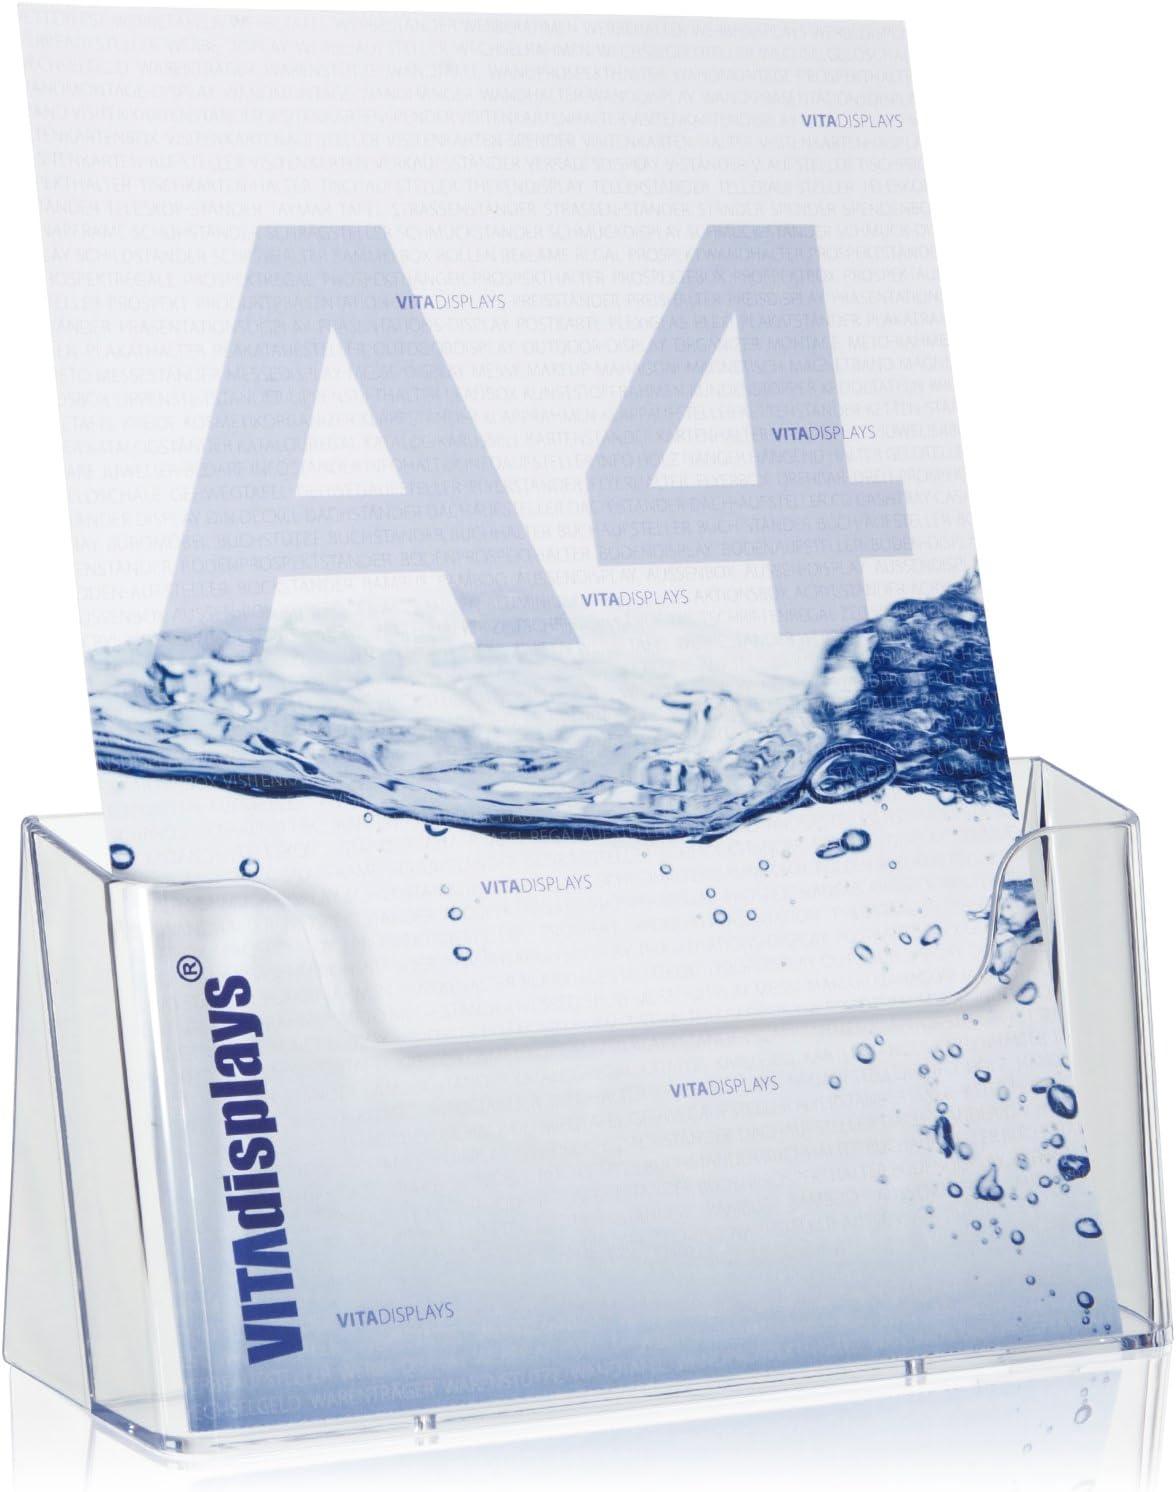 DIN A4 Soporte para folletos transparente VITAdisplays